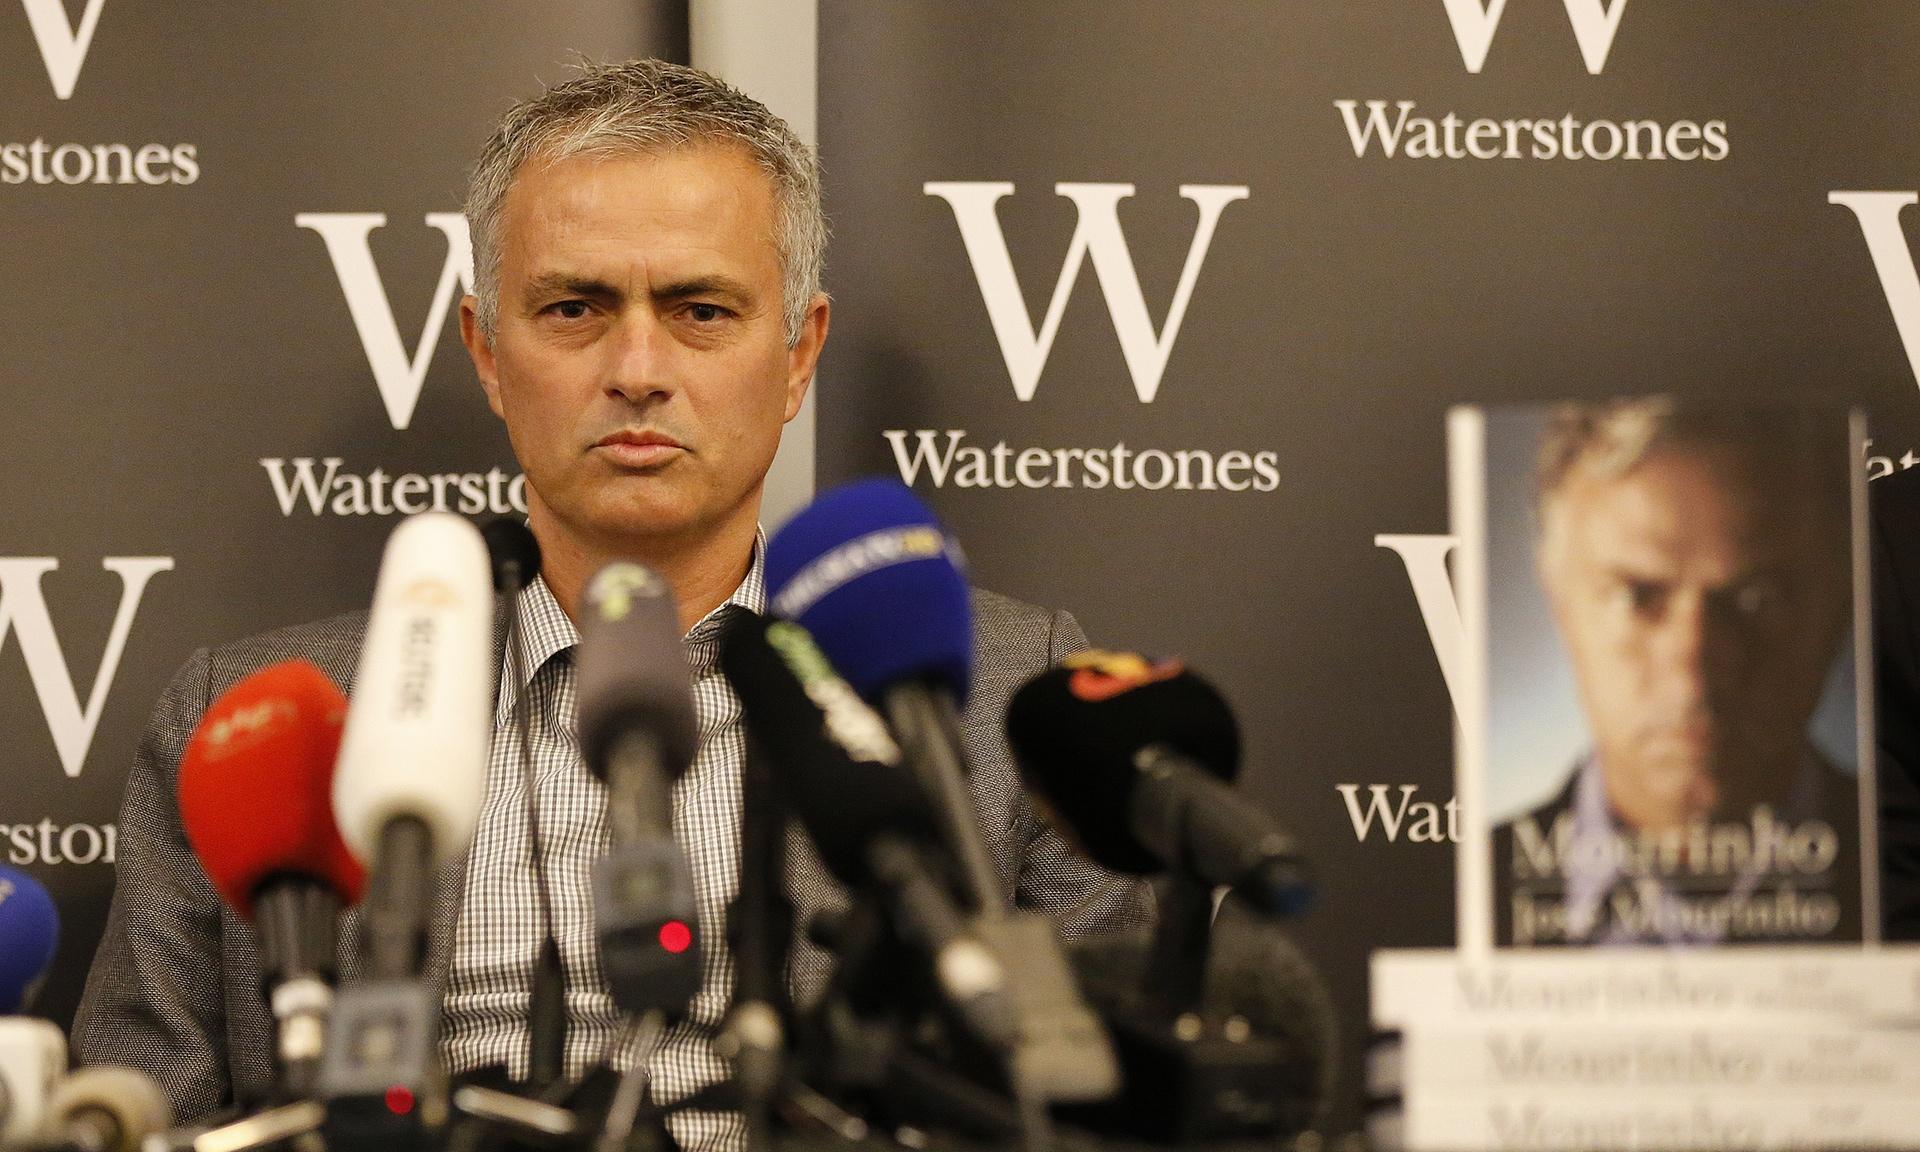 Komentar Seharga 50 Ribu Pounds dari José Mourinho